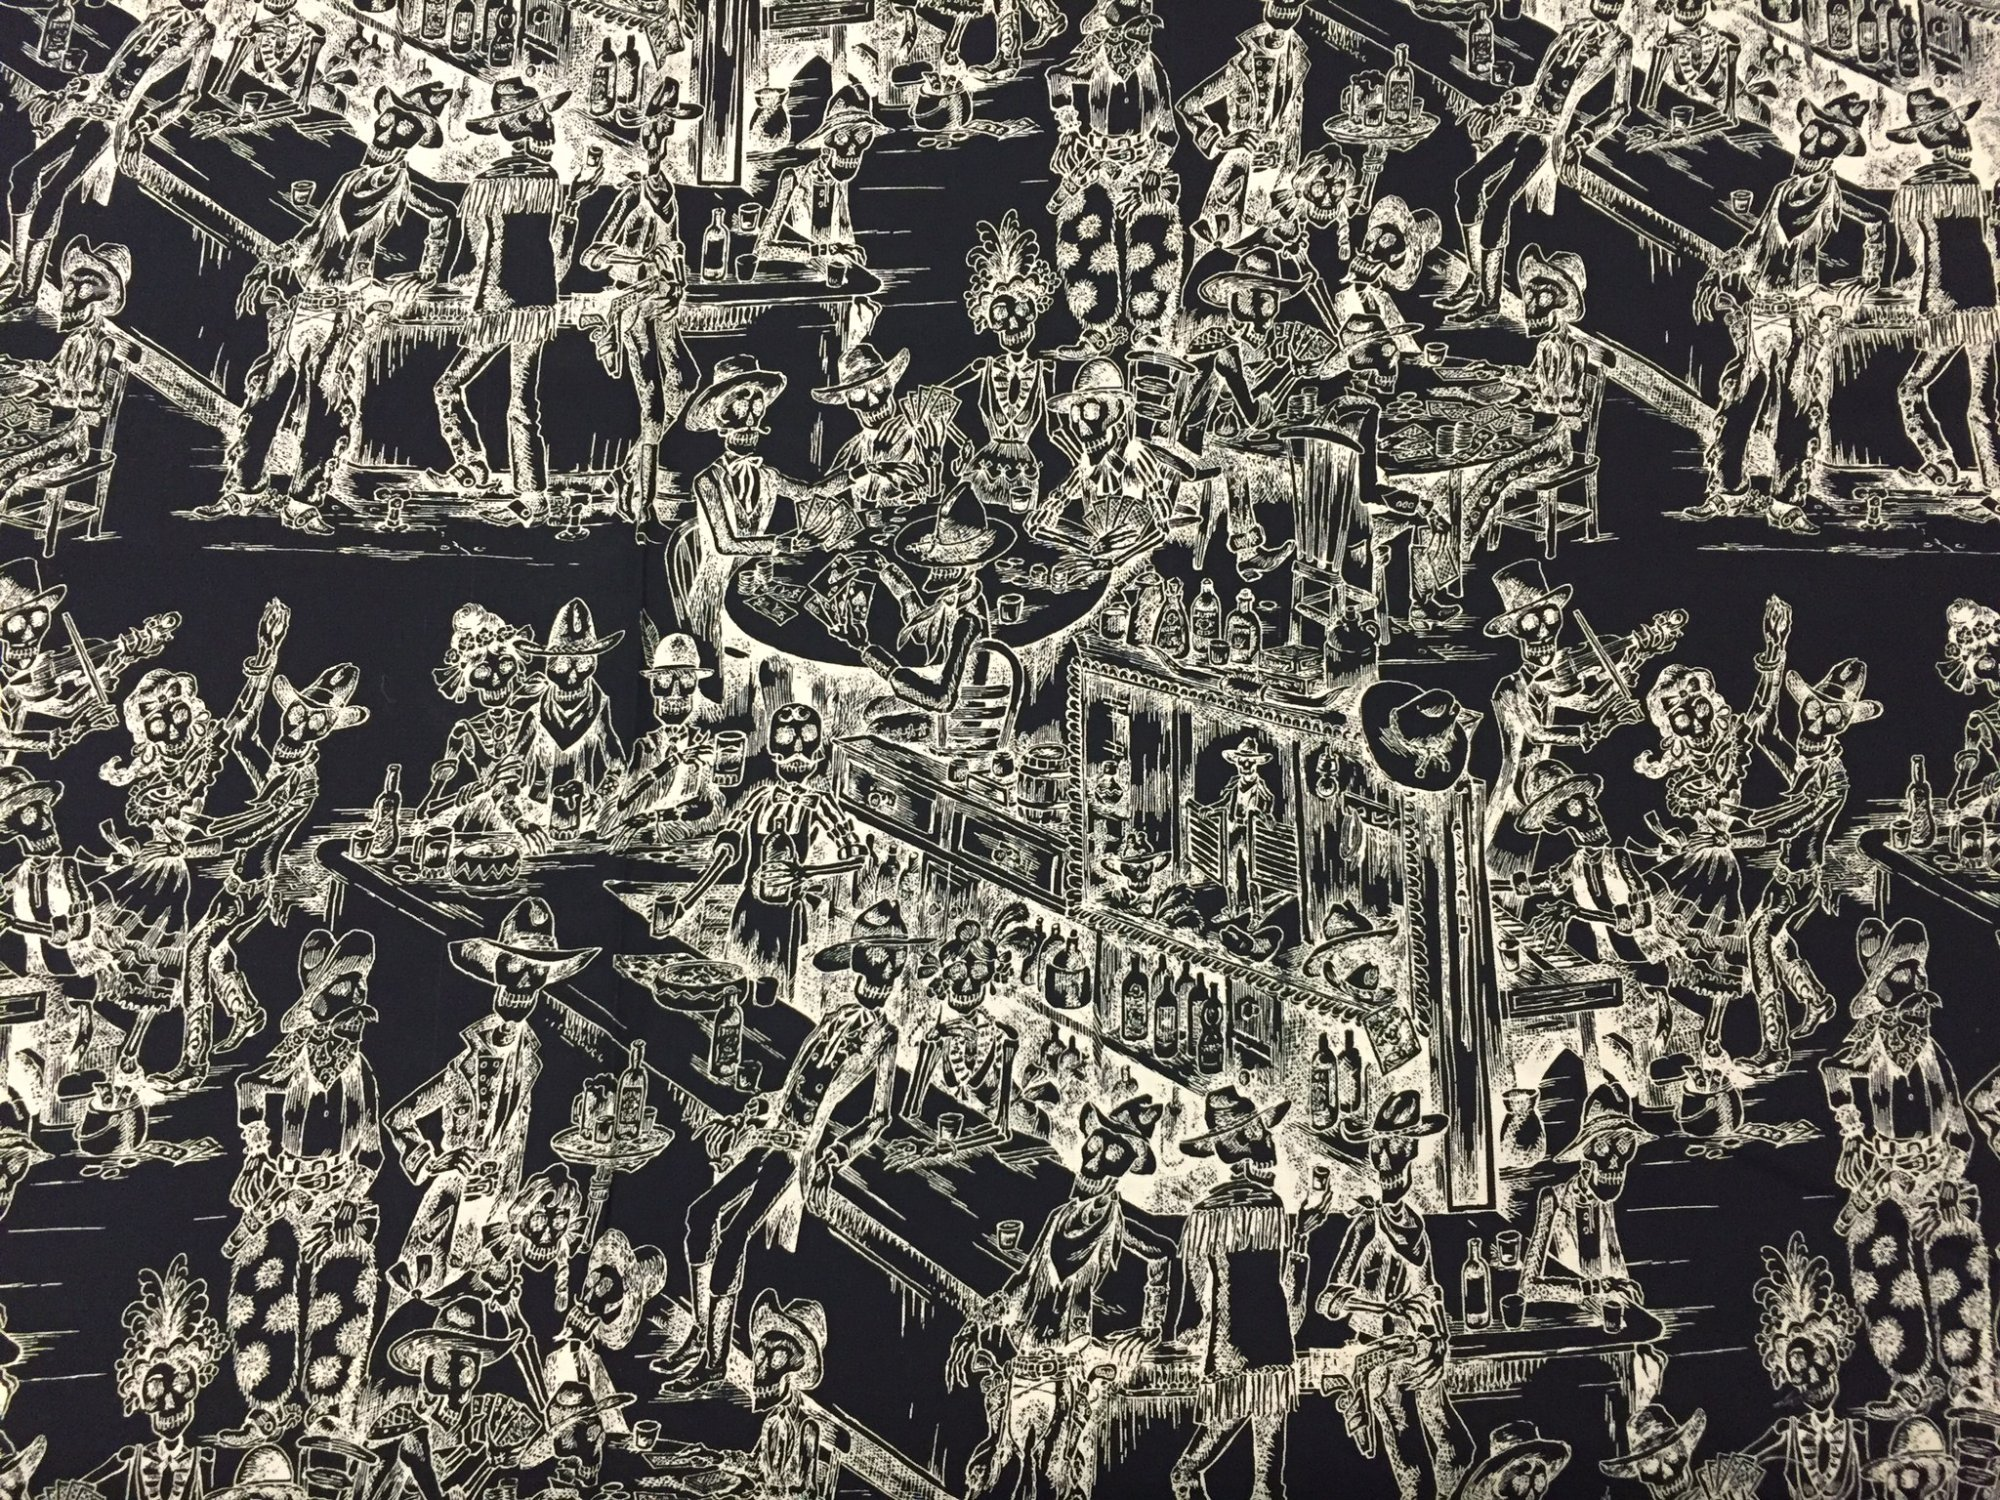 Dia de los Muertos Spooky Saloon Skeleton Toile Day of the Dead Skele-Toile Cotton Quilt Fabric AH183